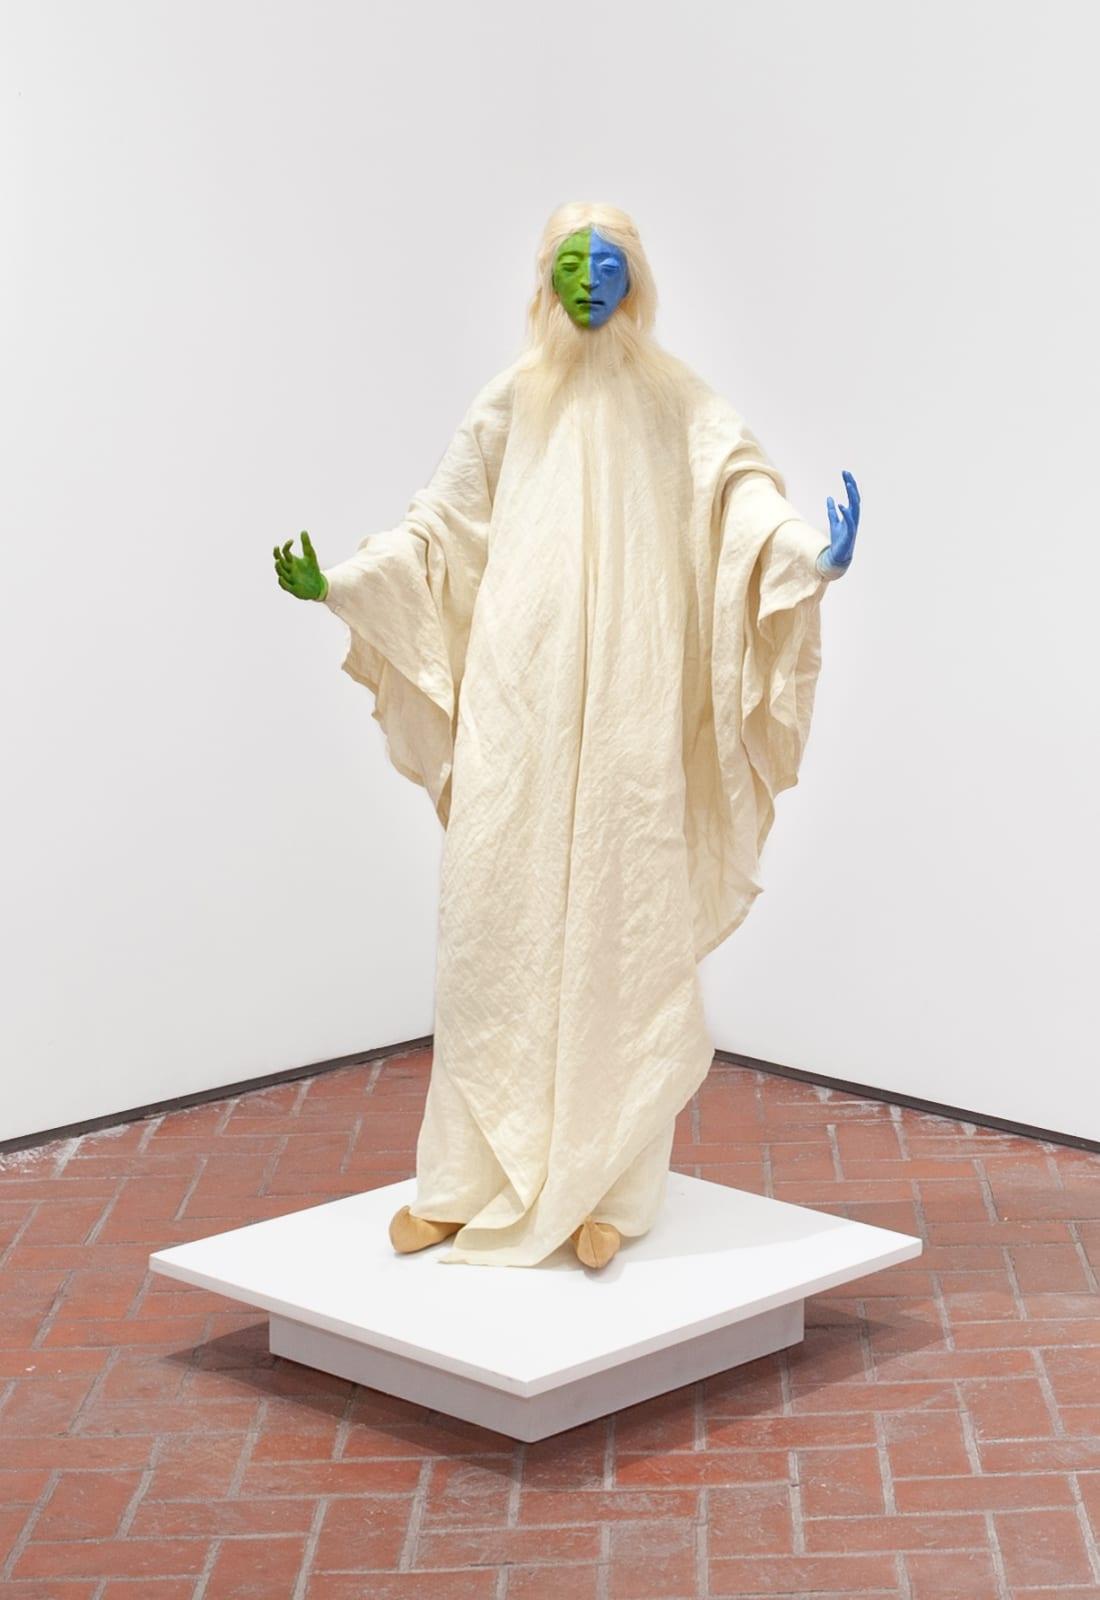 Francis Upritchard, AC Flash DC, 2013